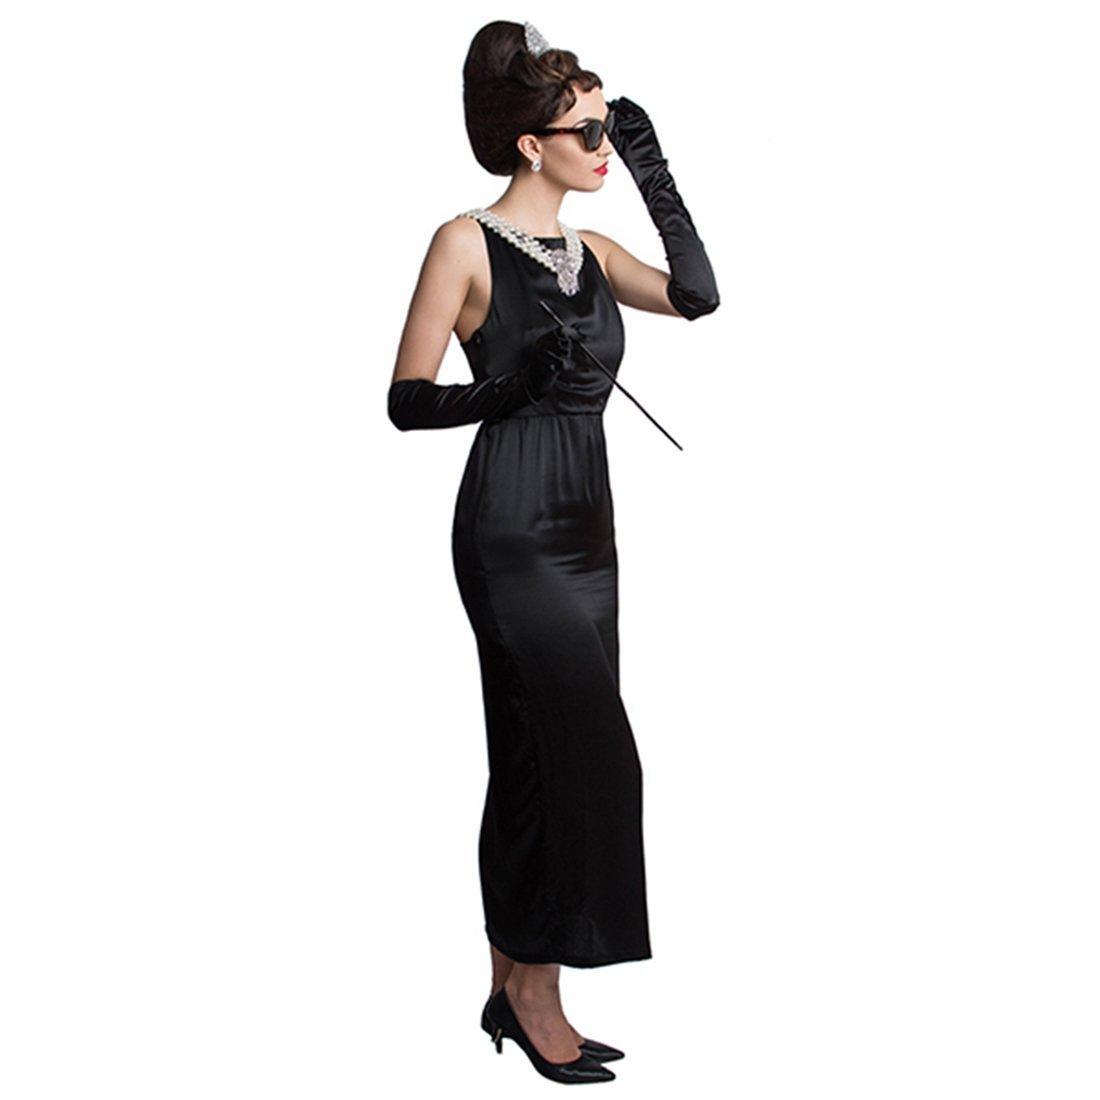 Audrey Hepburn ''Breakfast at Tiffany's'' Complete Costume Set - Satin Version (S) w/Gift Box by Utopiat (Image #3)